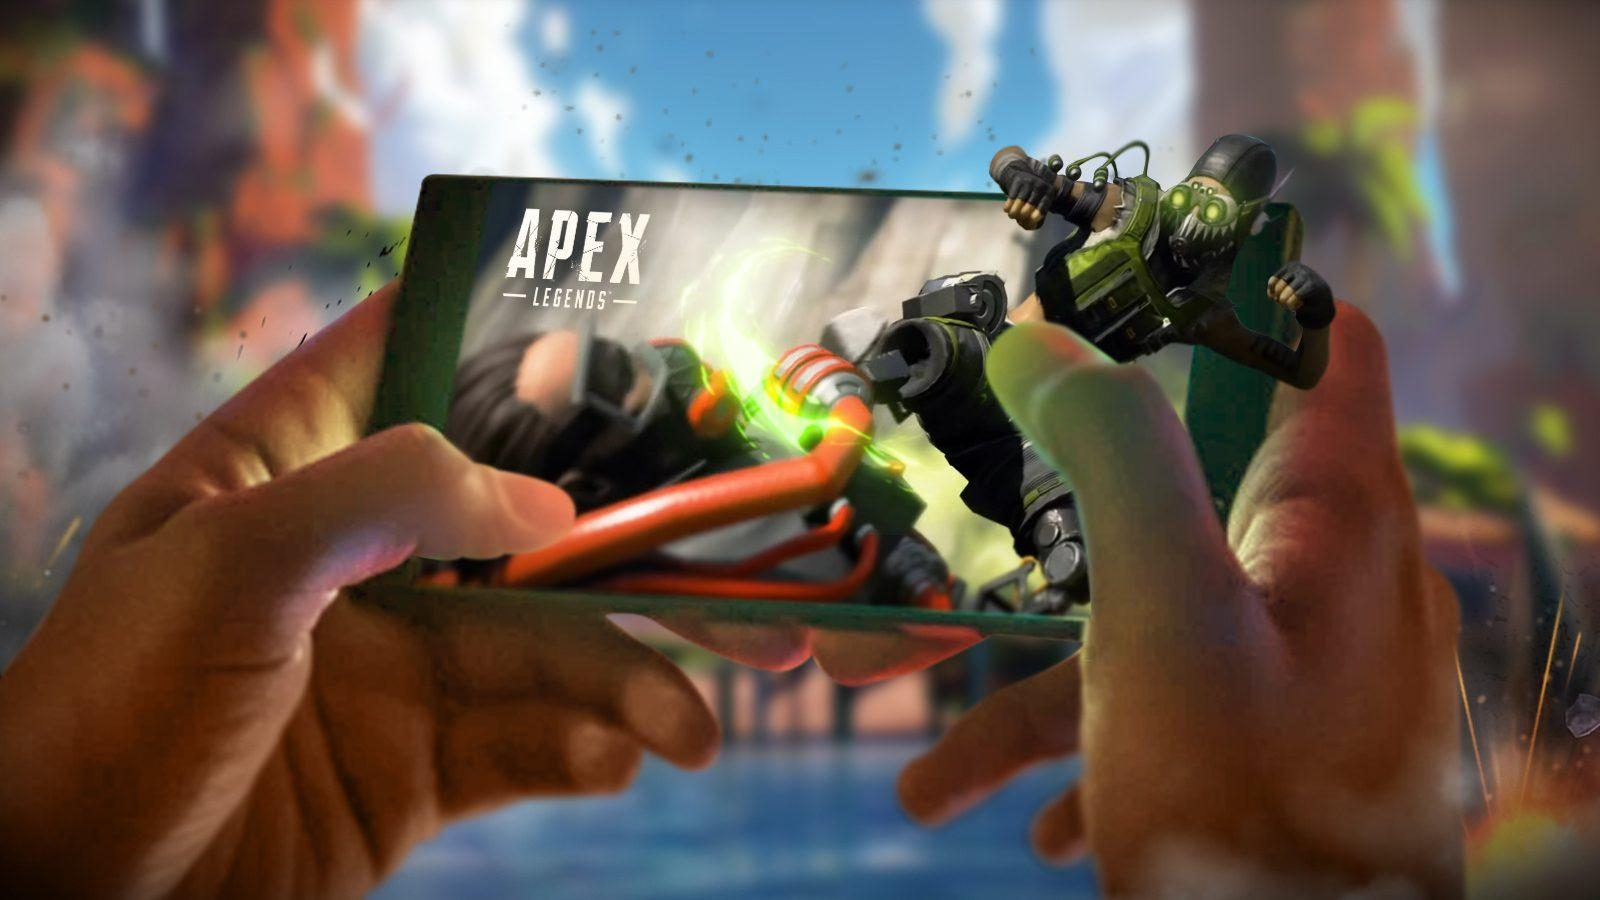 【APEX】モバイル版エーペックスには将来的に「排除モード」が実装されるかも!?新マップ内画像やロードスクリーンがリーク!!